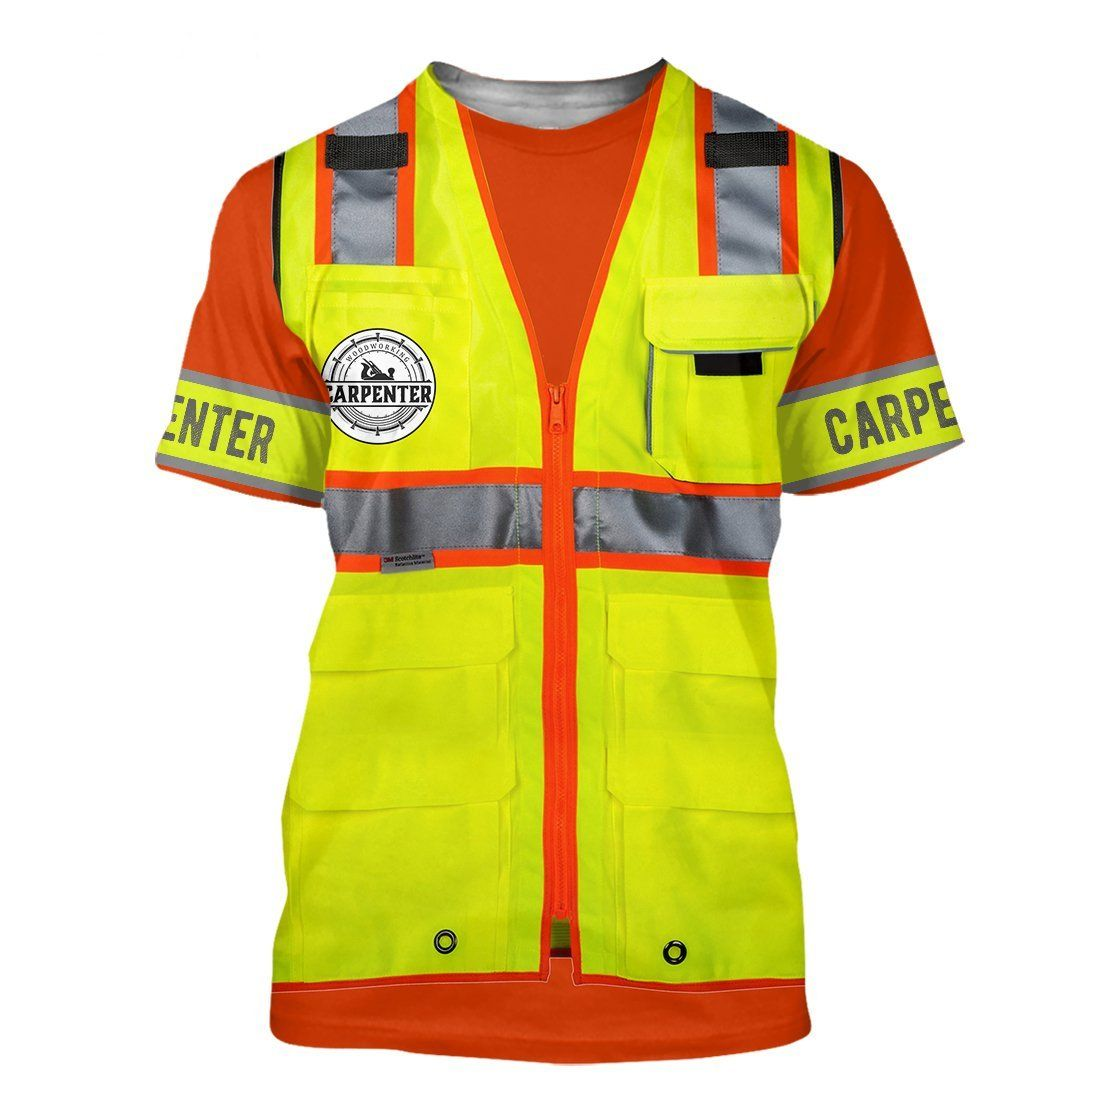 Premium Custom Name Carpenter 3D All Over Printed Unisex - T-shirt / XXL